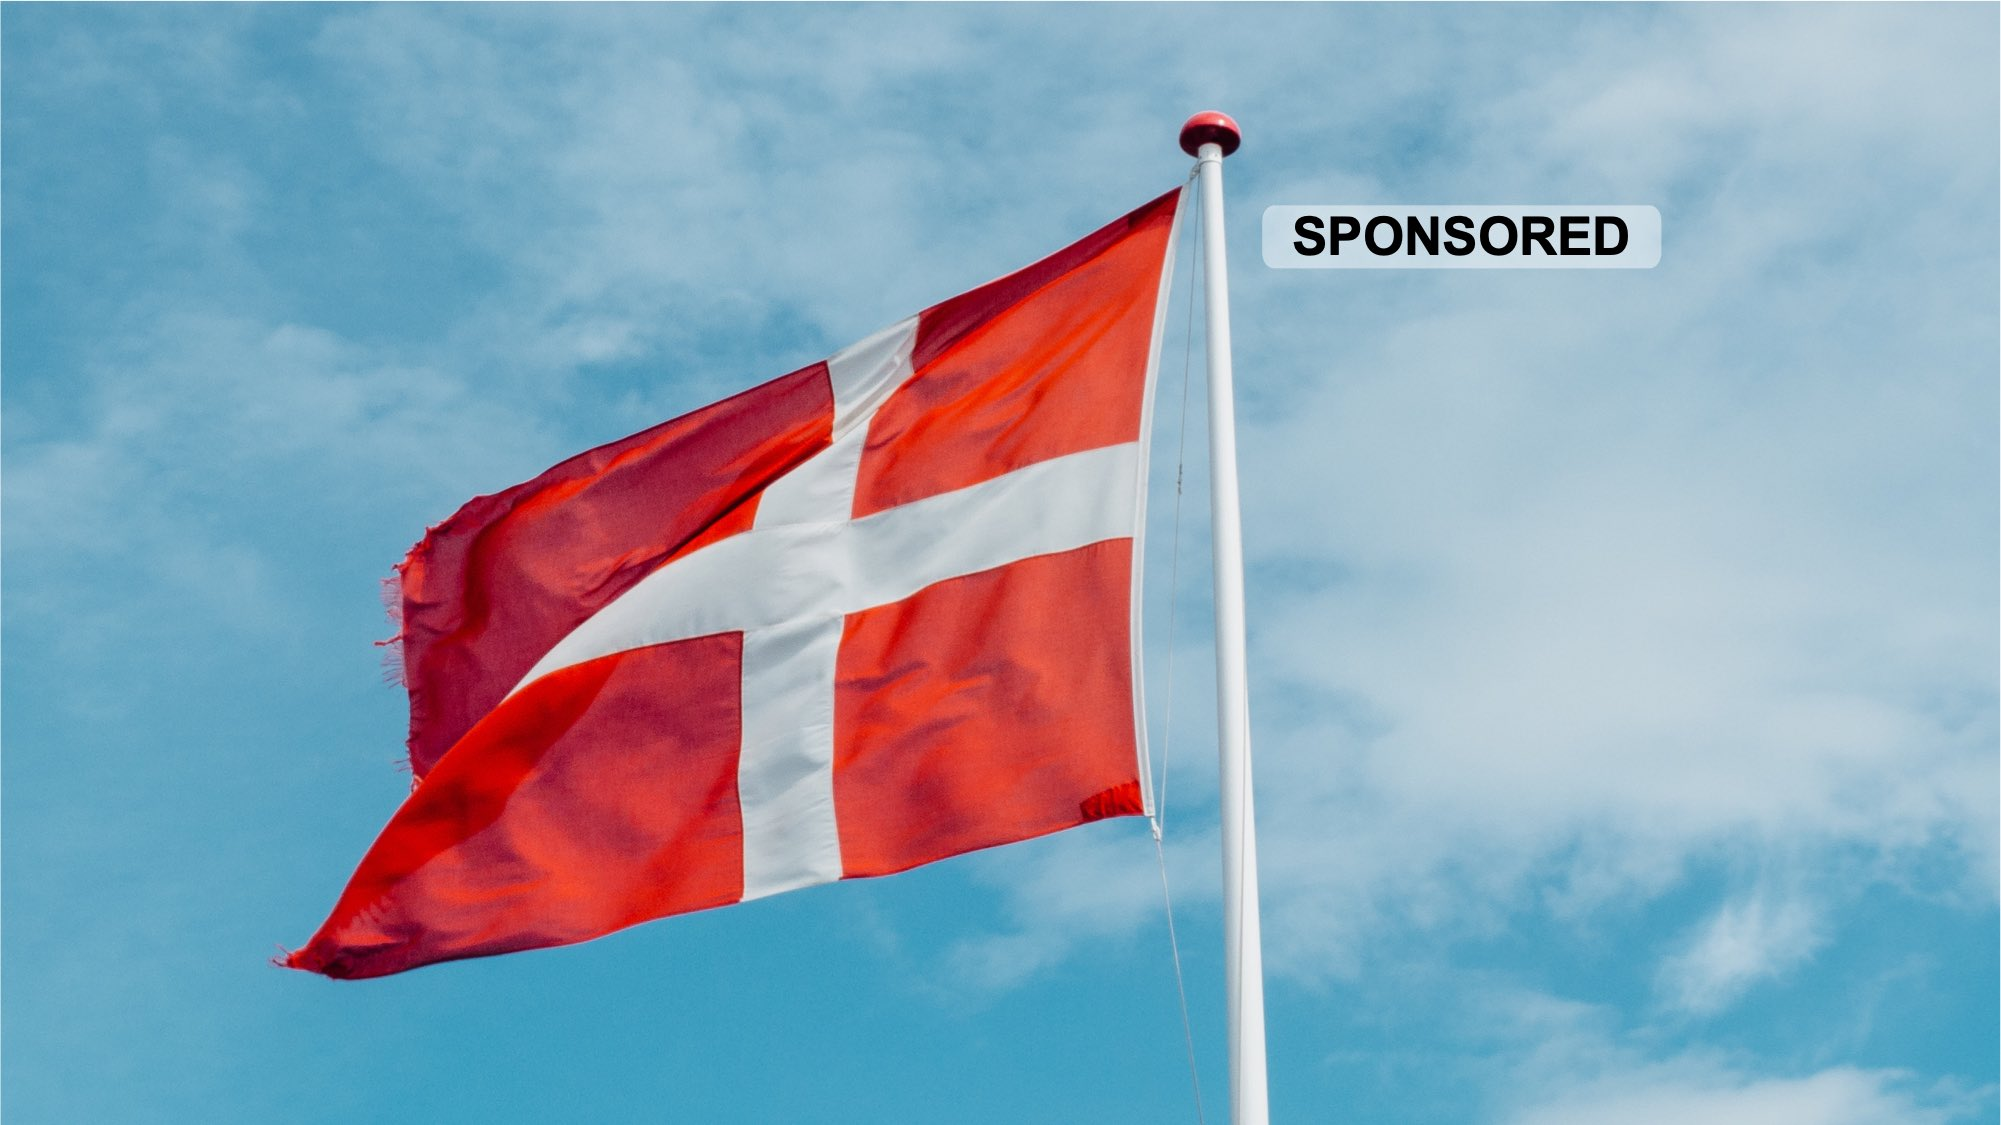 sponsored-danish-flag-as-in-euroclear-dkk